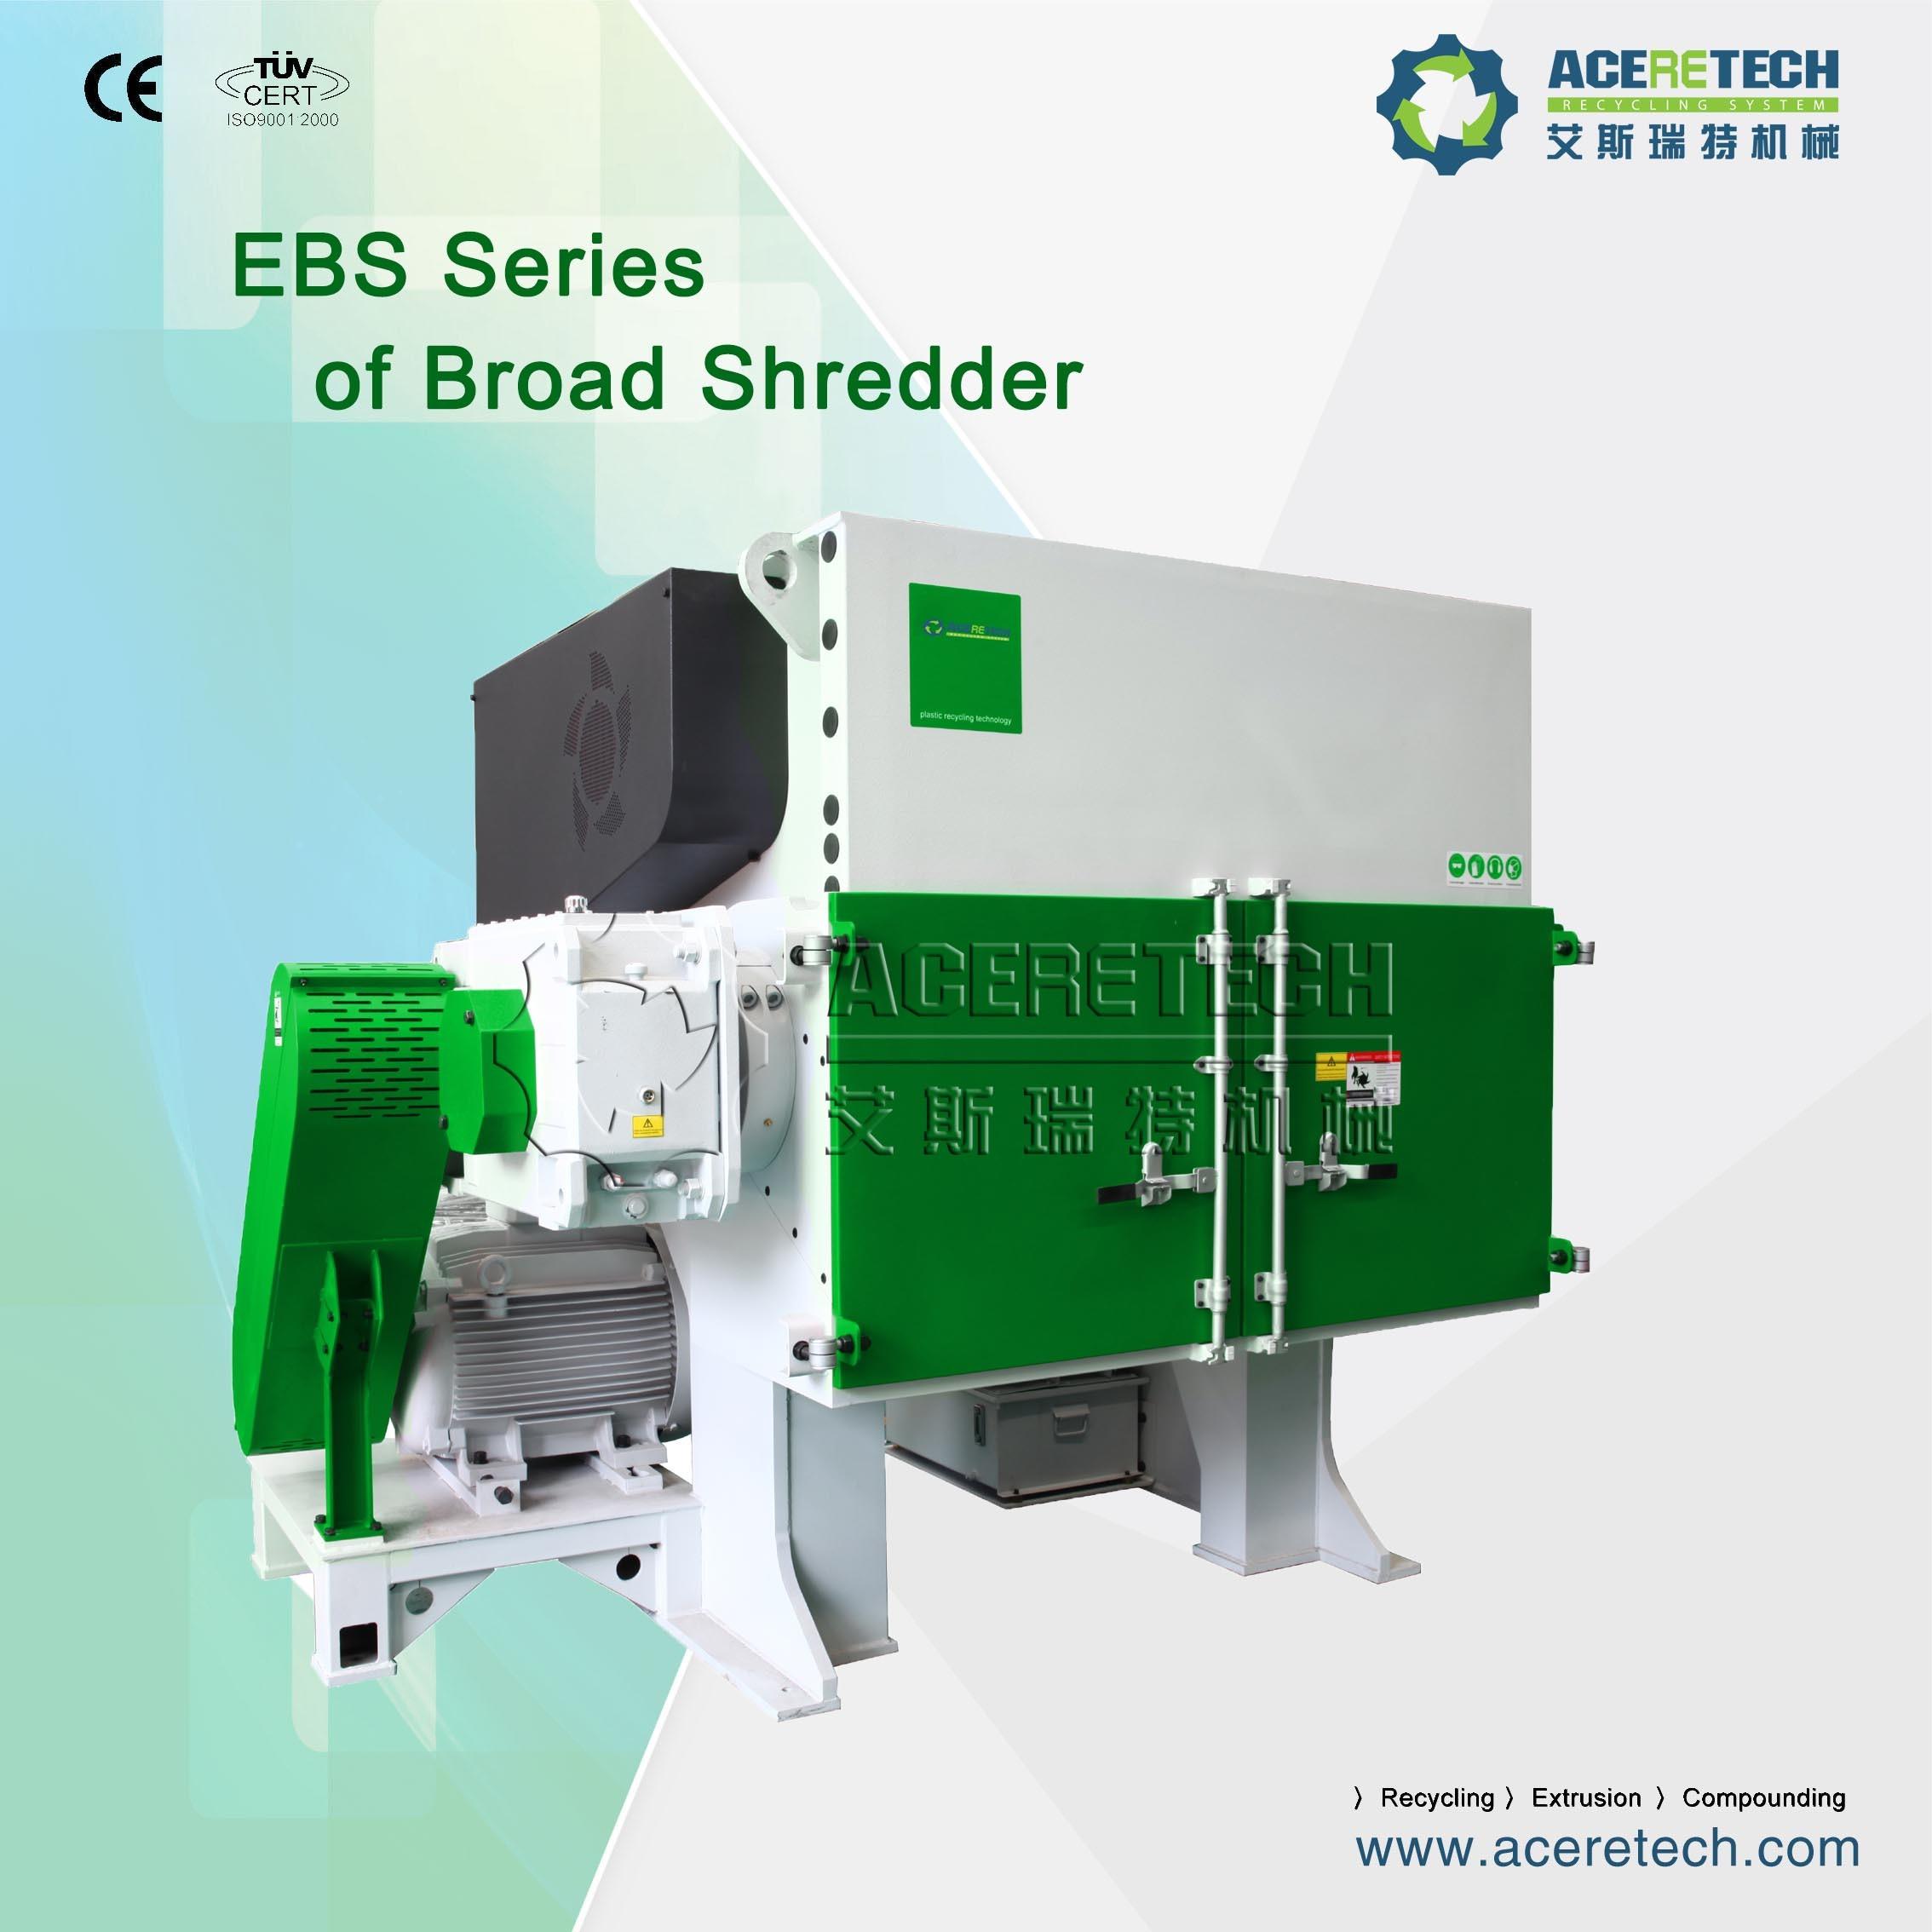 Single Shaft Shredder Plastic Recycling for Boards